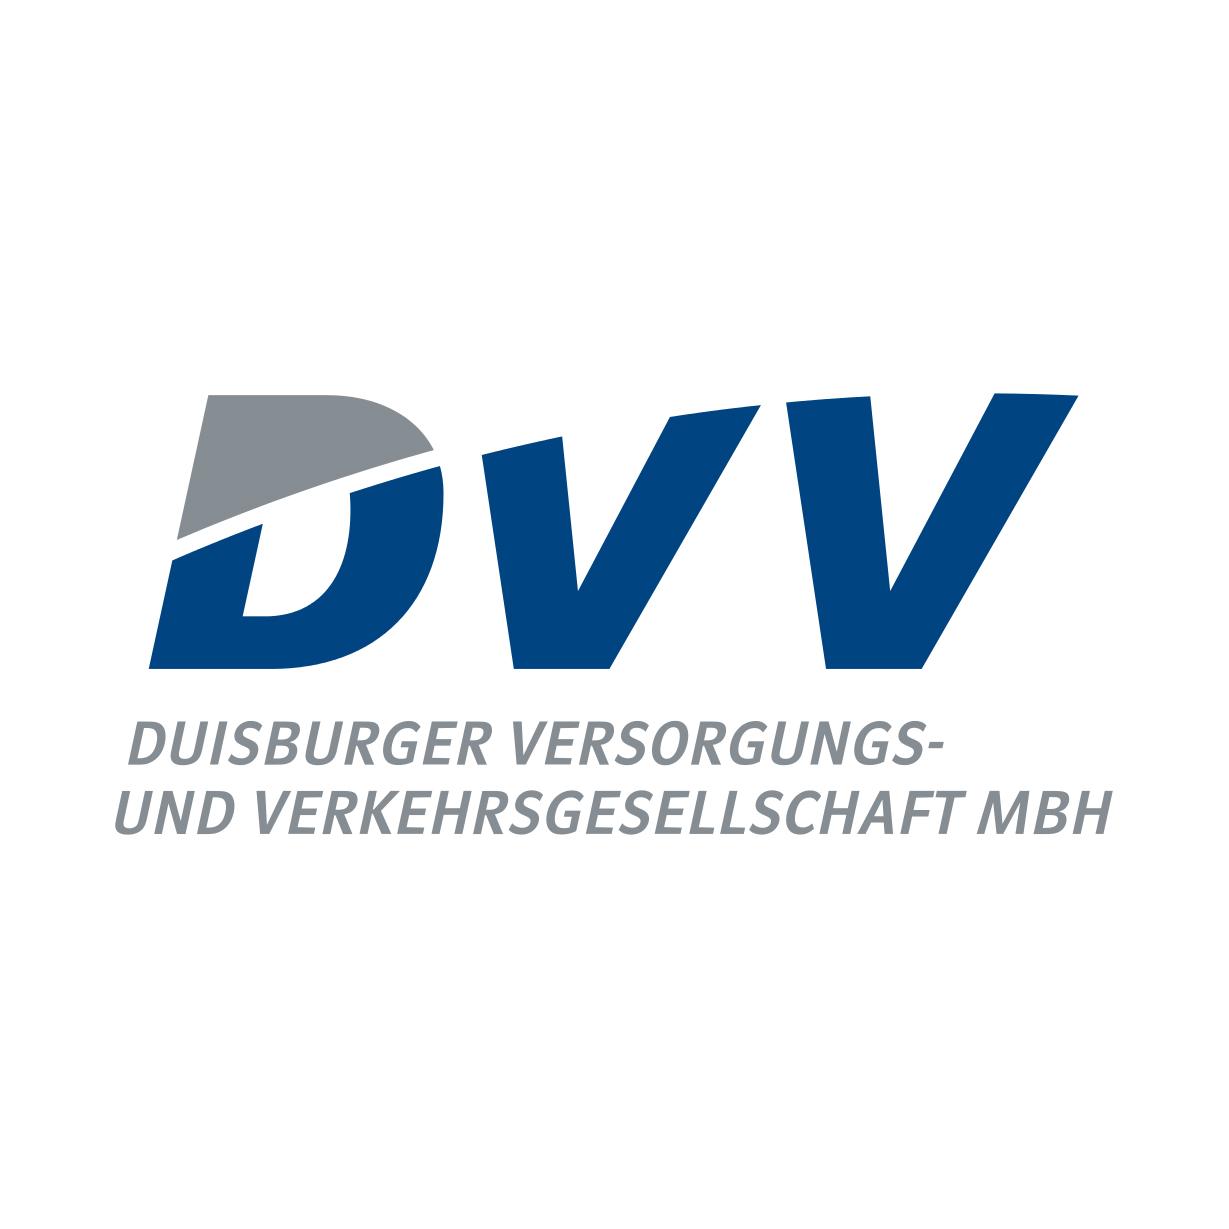 Partnerlogo Duisburger Versorgungs- und Verkehrsgesellschaft mbH